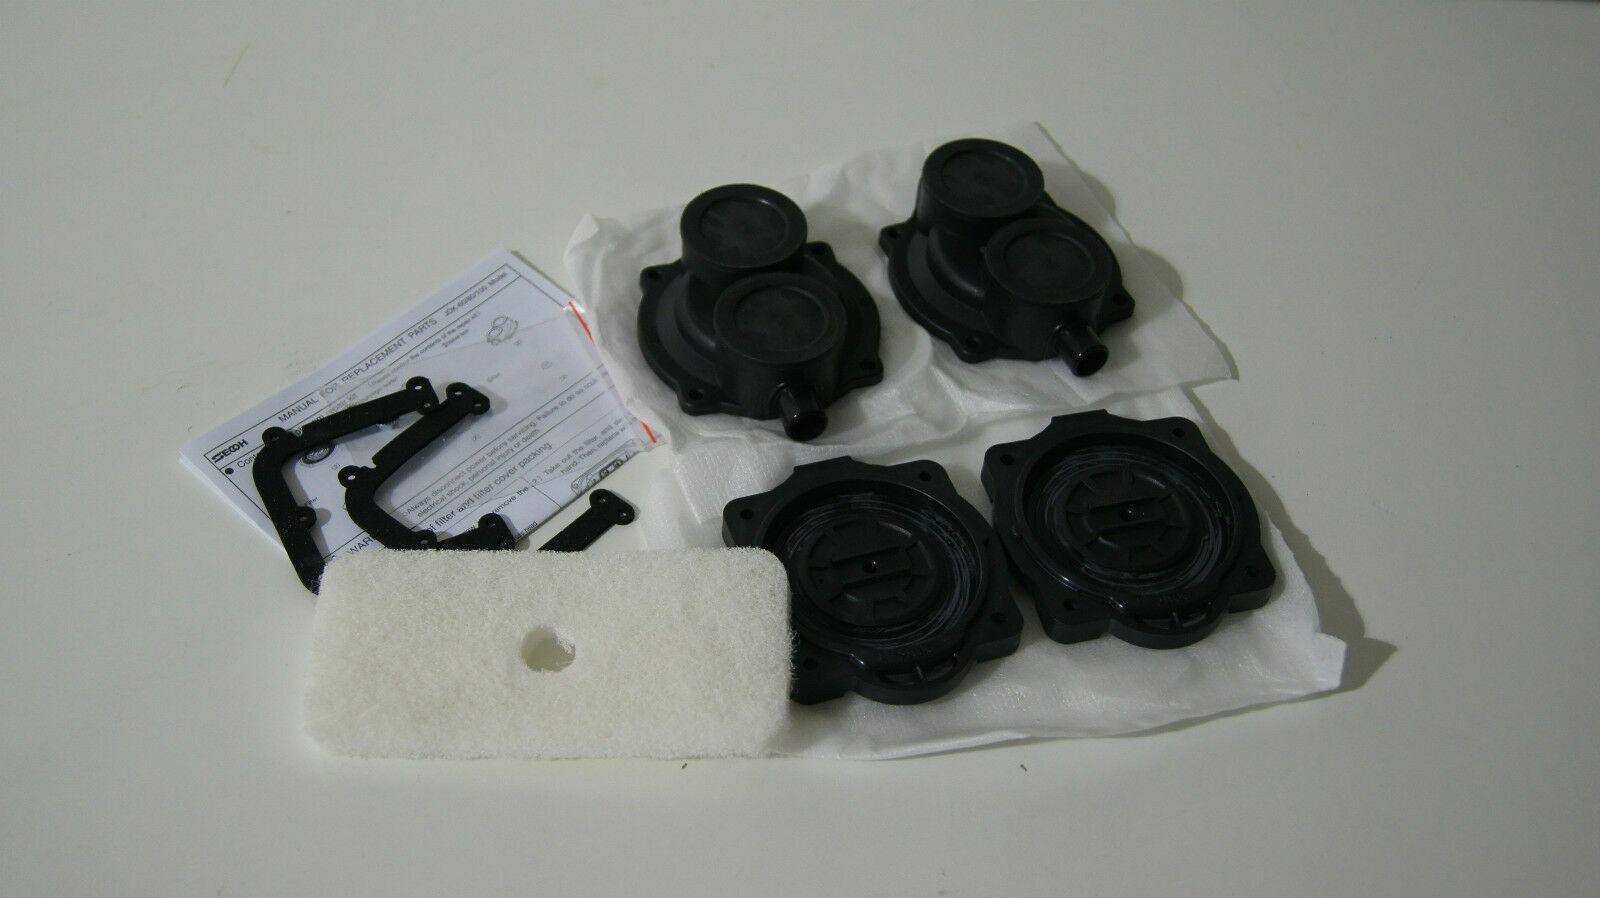 Secoh Full Service Kit for JDK 100/120 Air pump for Pond or Sewage Pump SE31